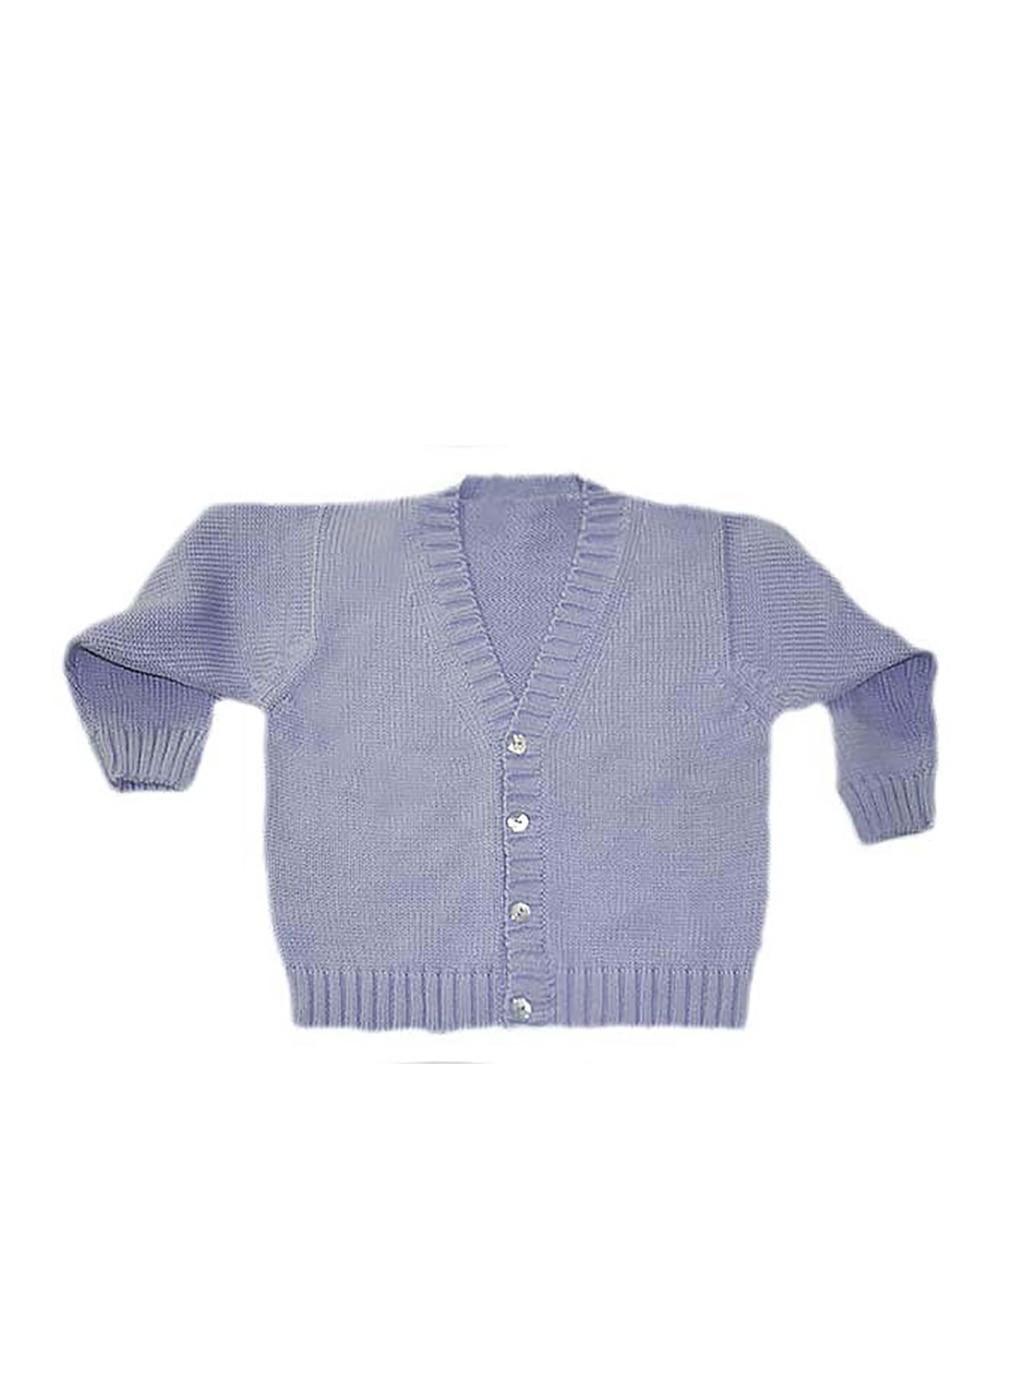 Cardigan bambino lana o cotone